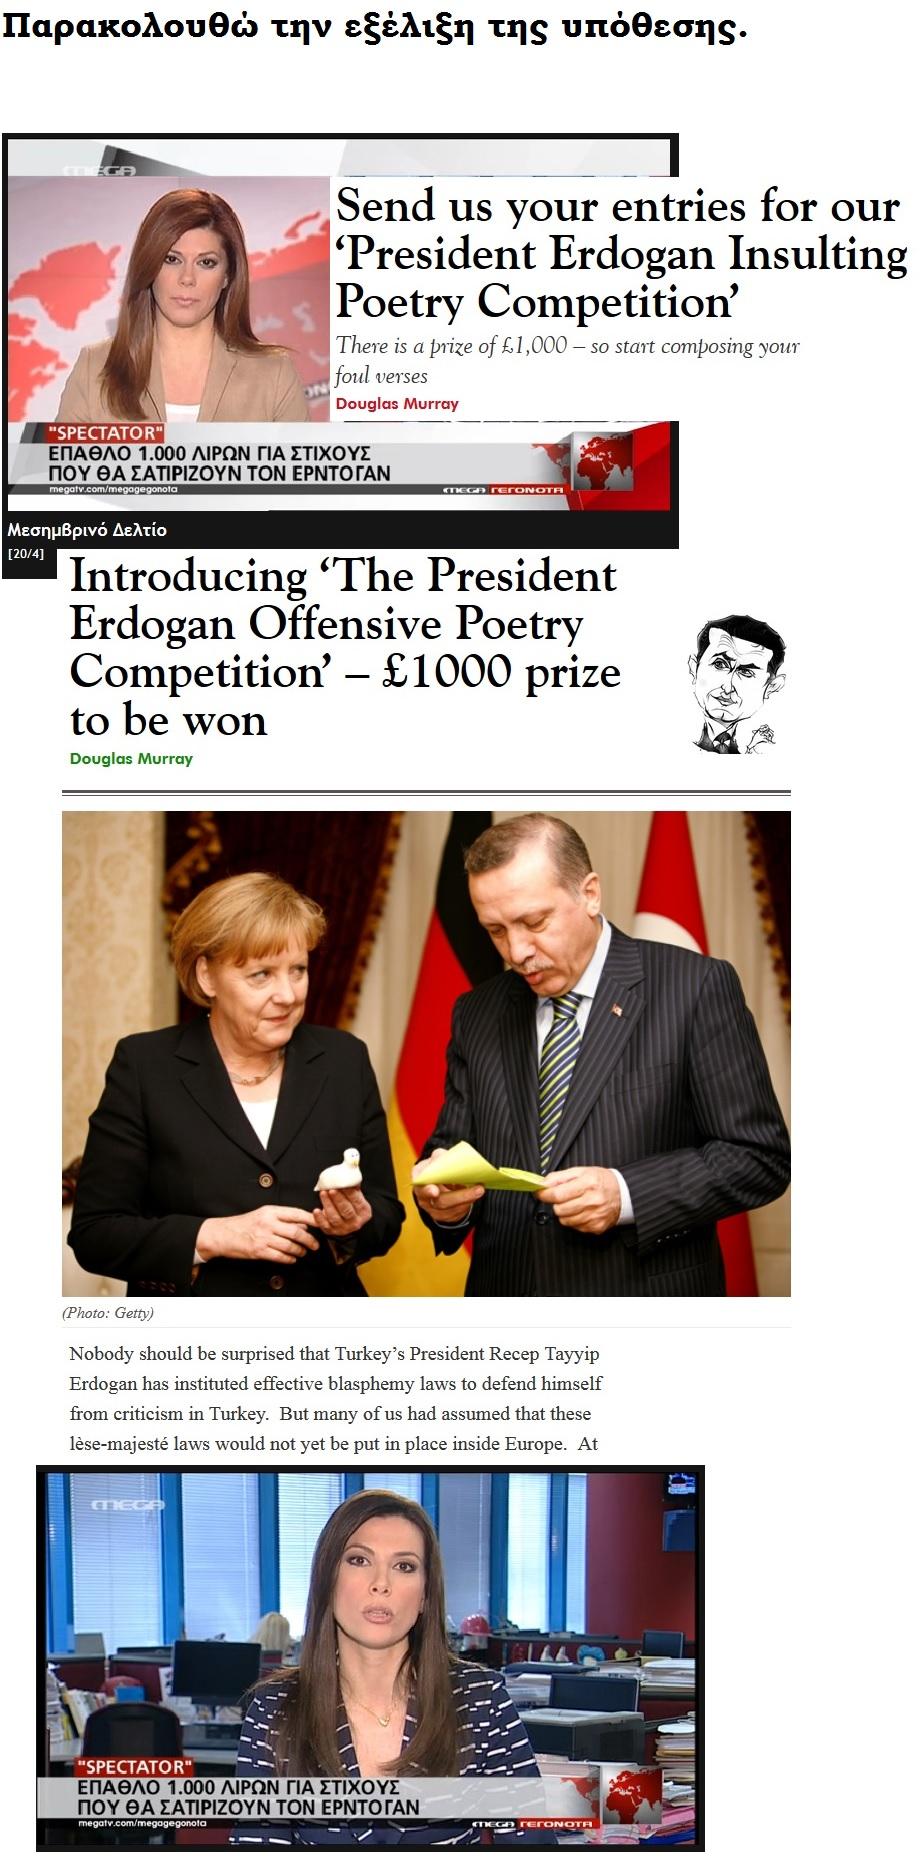 TURKEY ERDOGAN SPECTATOR 10 210416